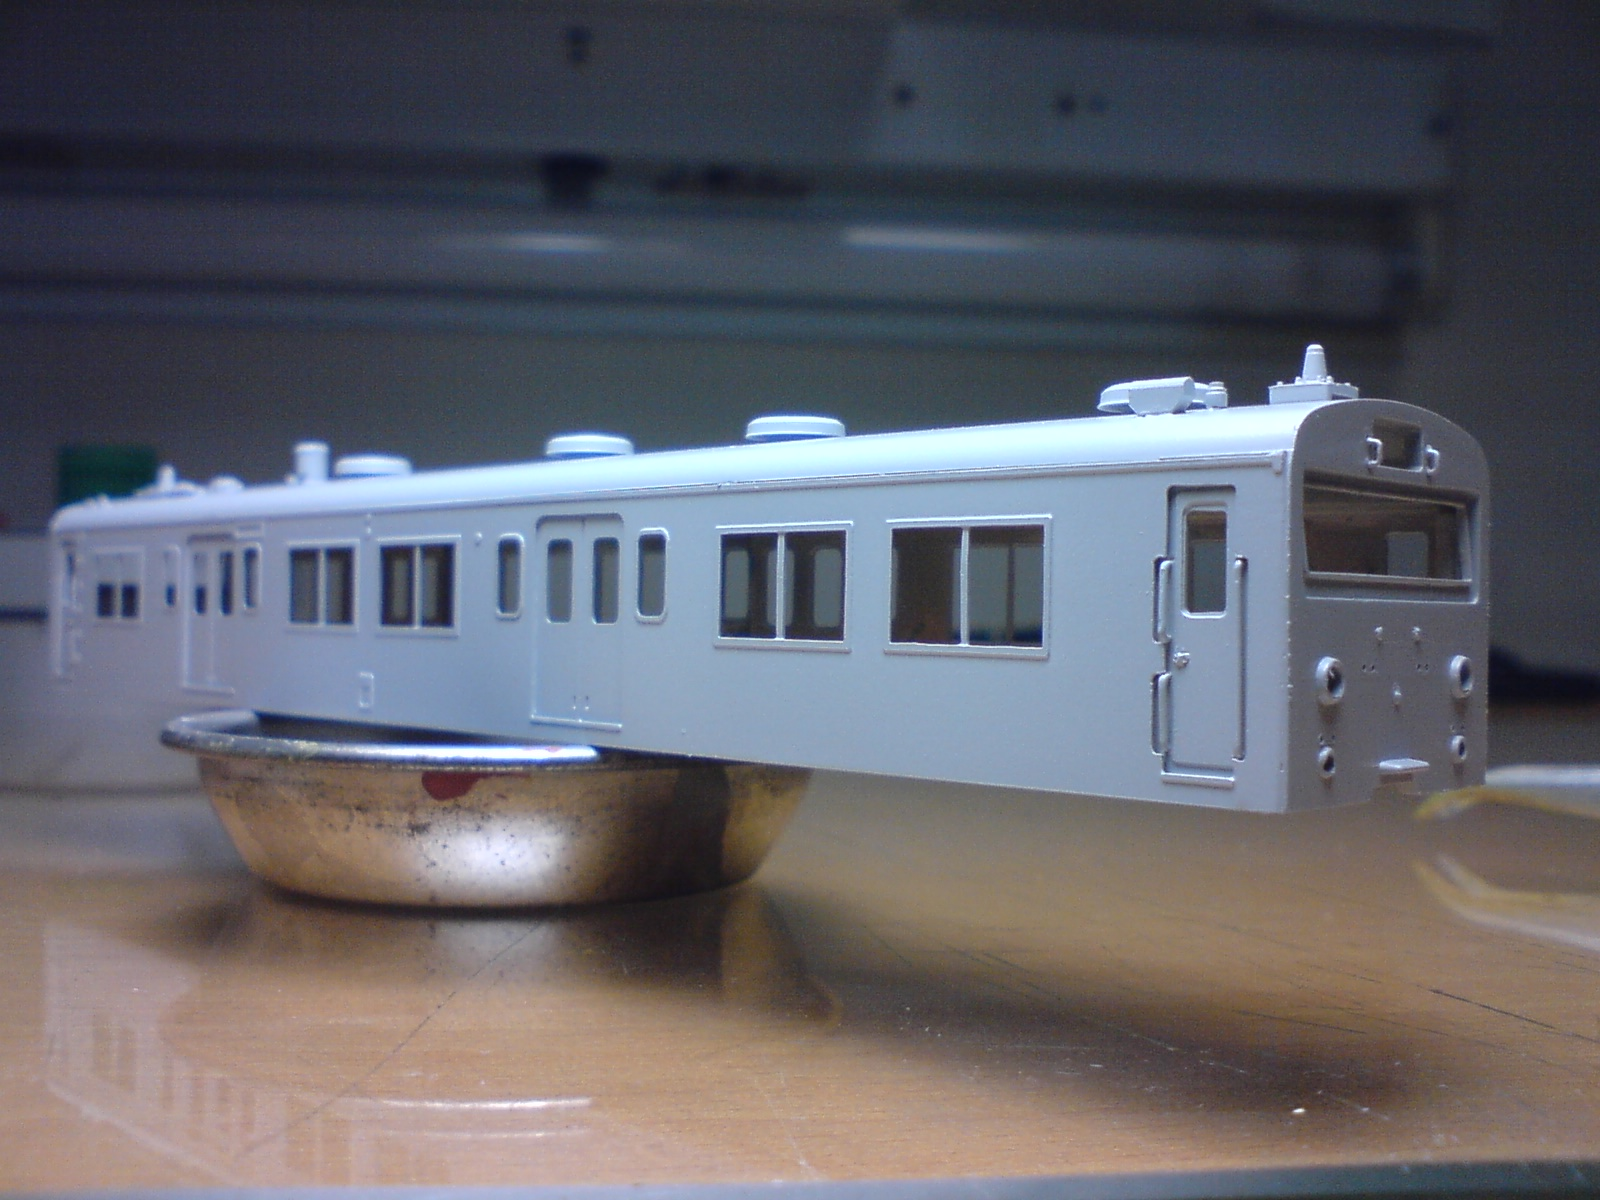 Kc380010